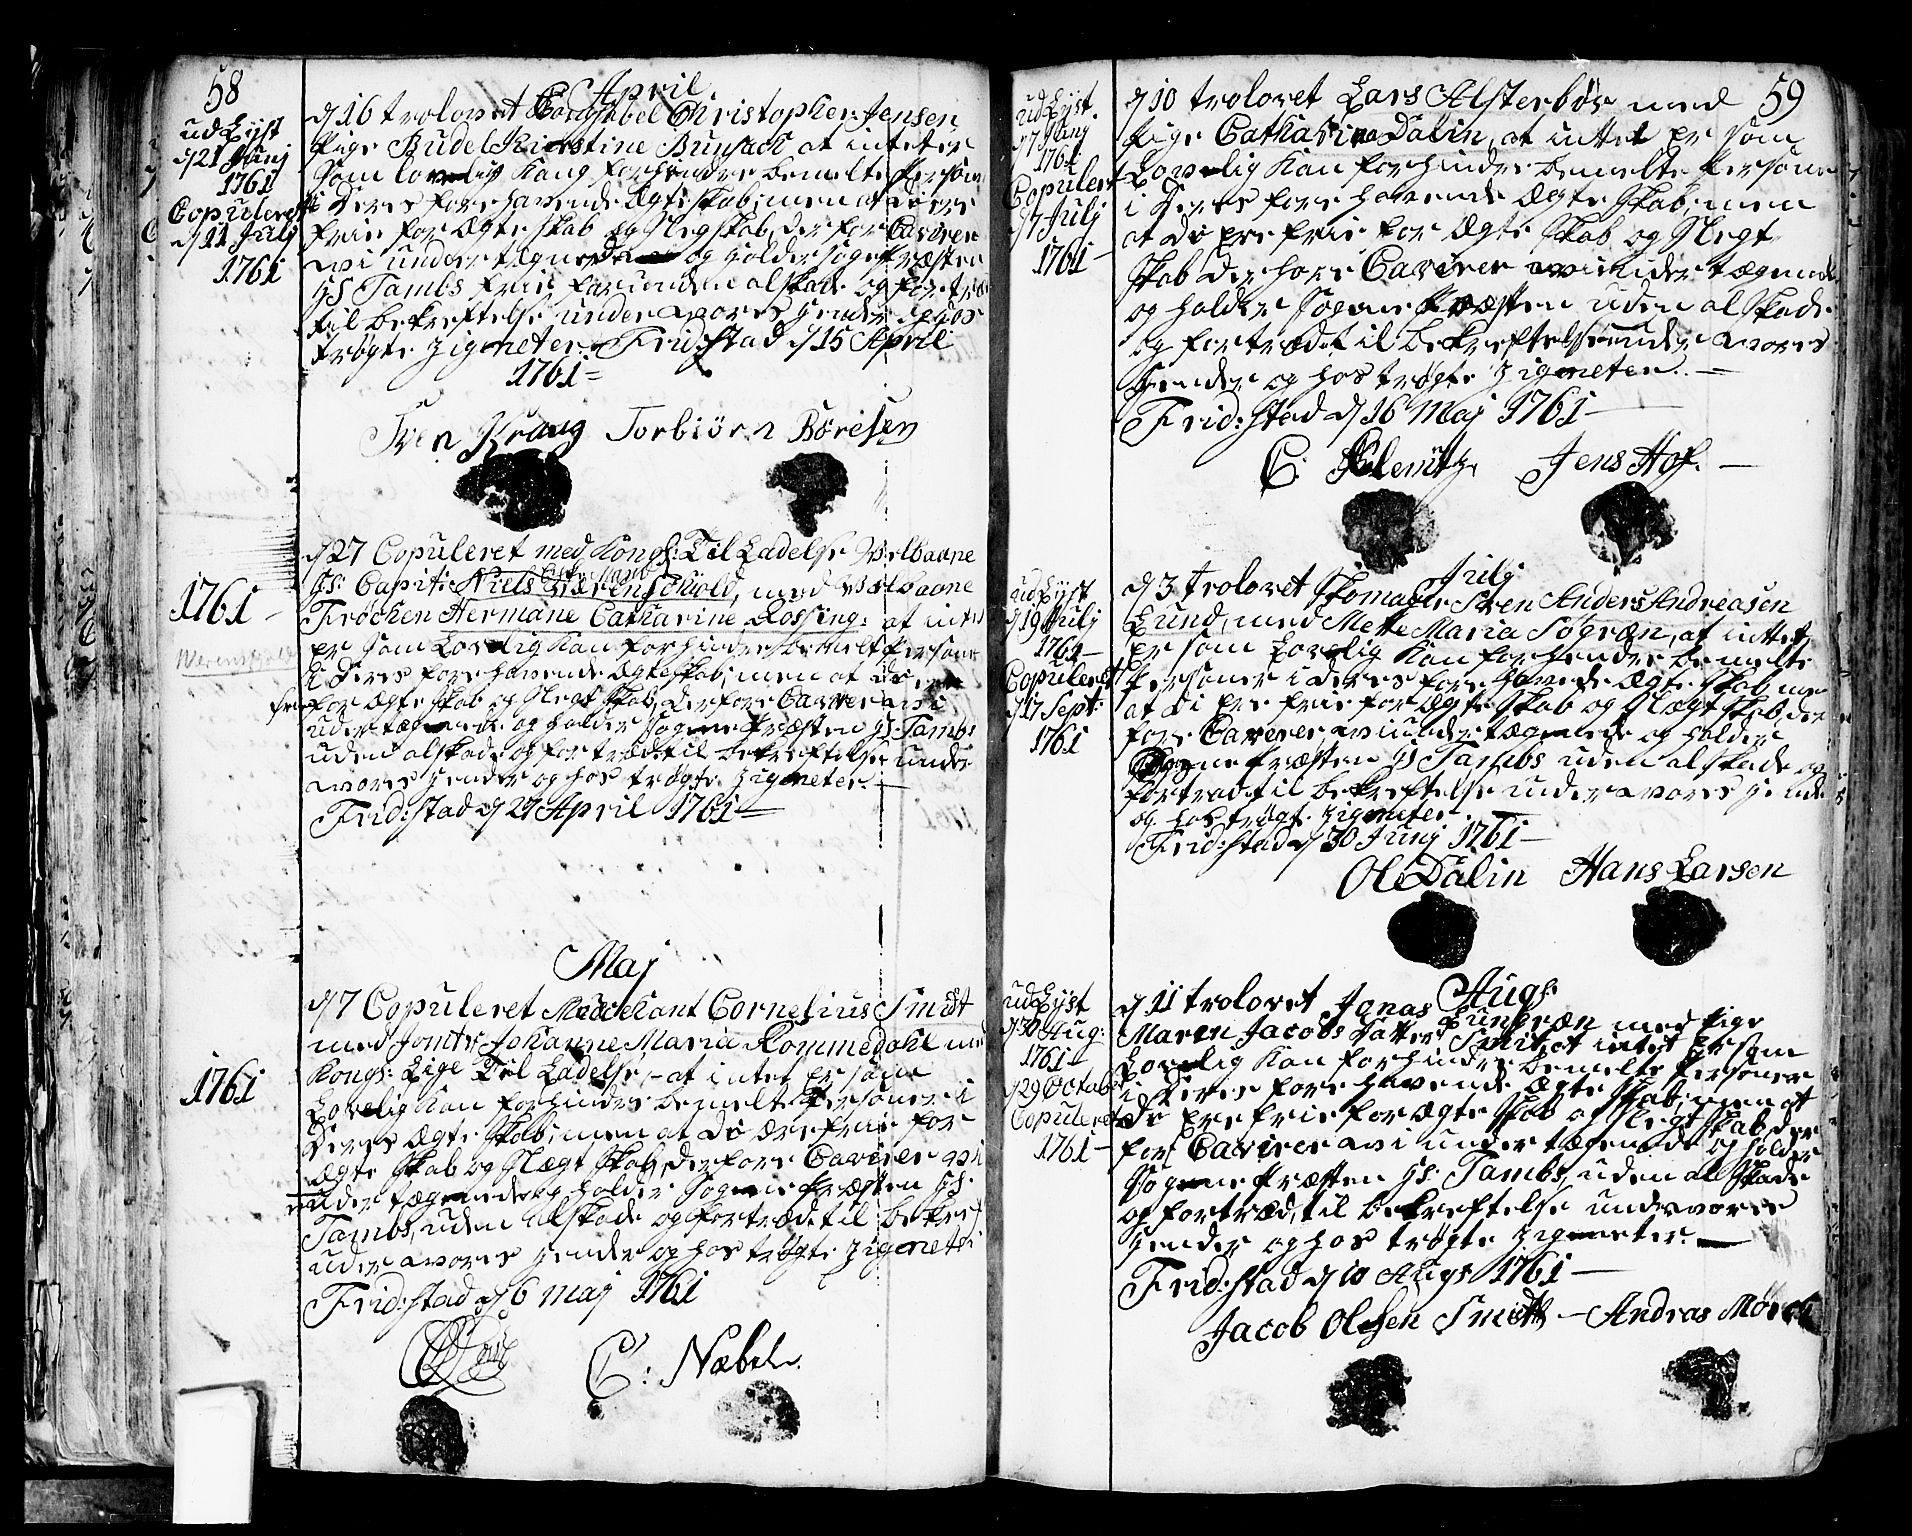 SAO, Fredrikstad prestekontor Kirkebøker, F/Fa/L0002: Parish register (official) no. 2, 1750-1804, p. 58-59